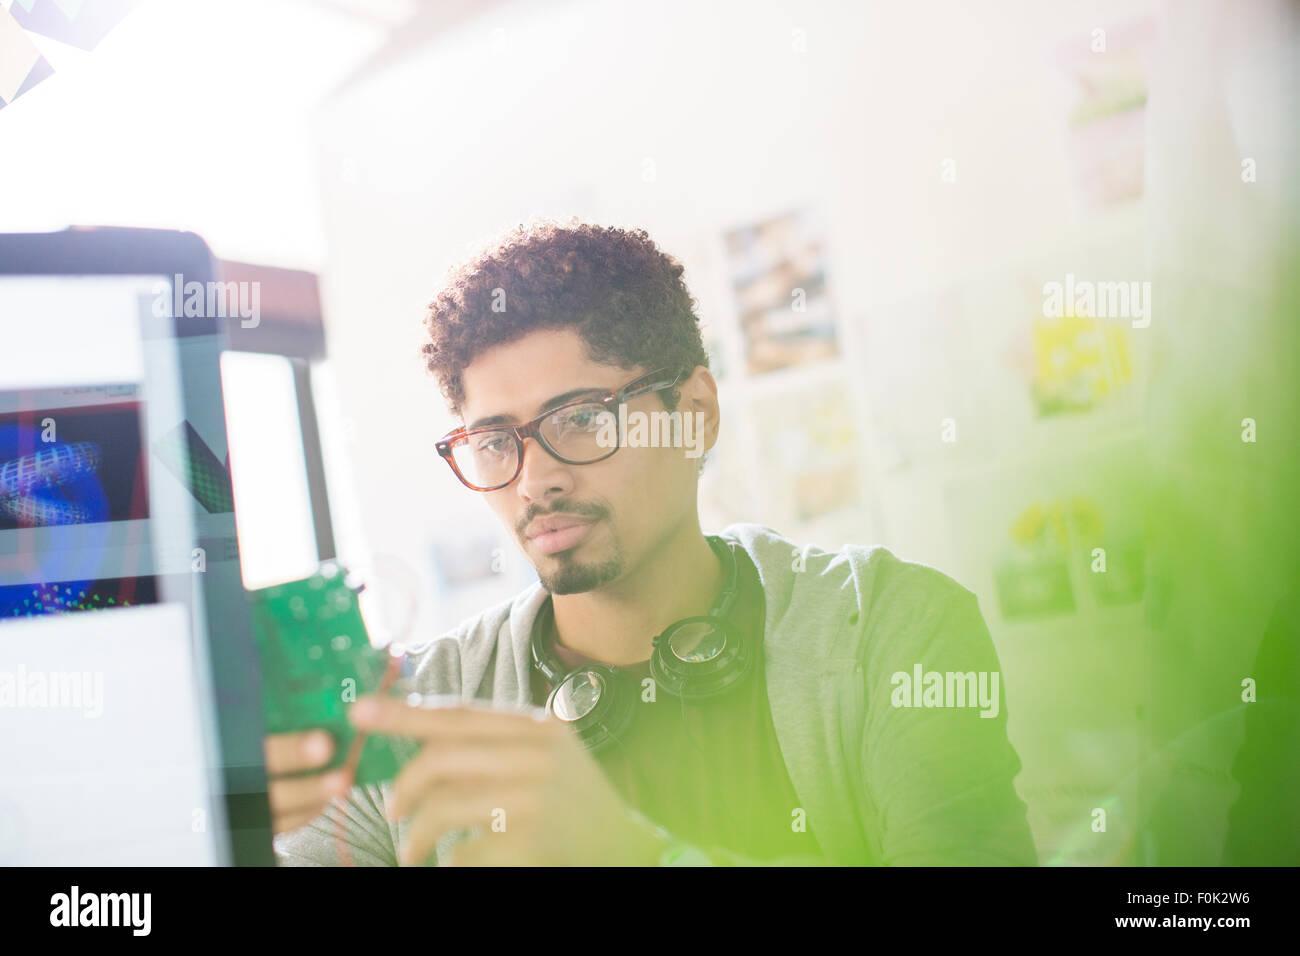 Creative designer with headphones examining part in office - Stock Image